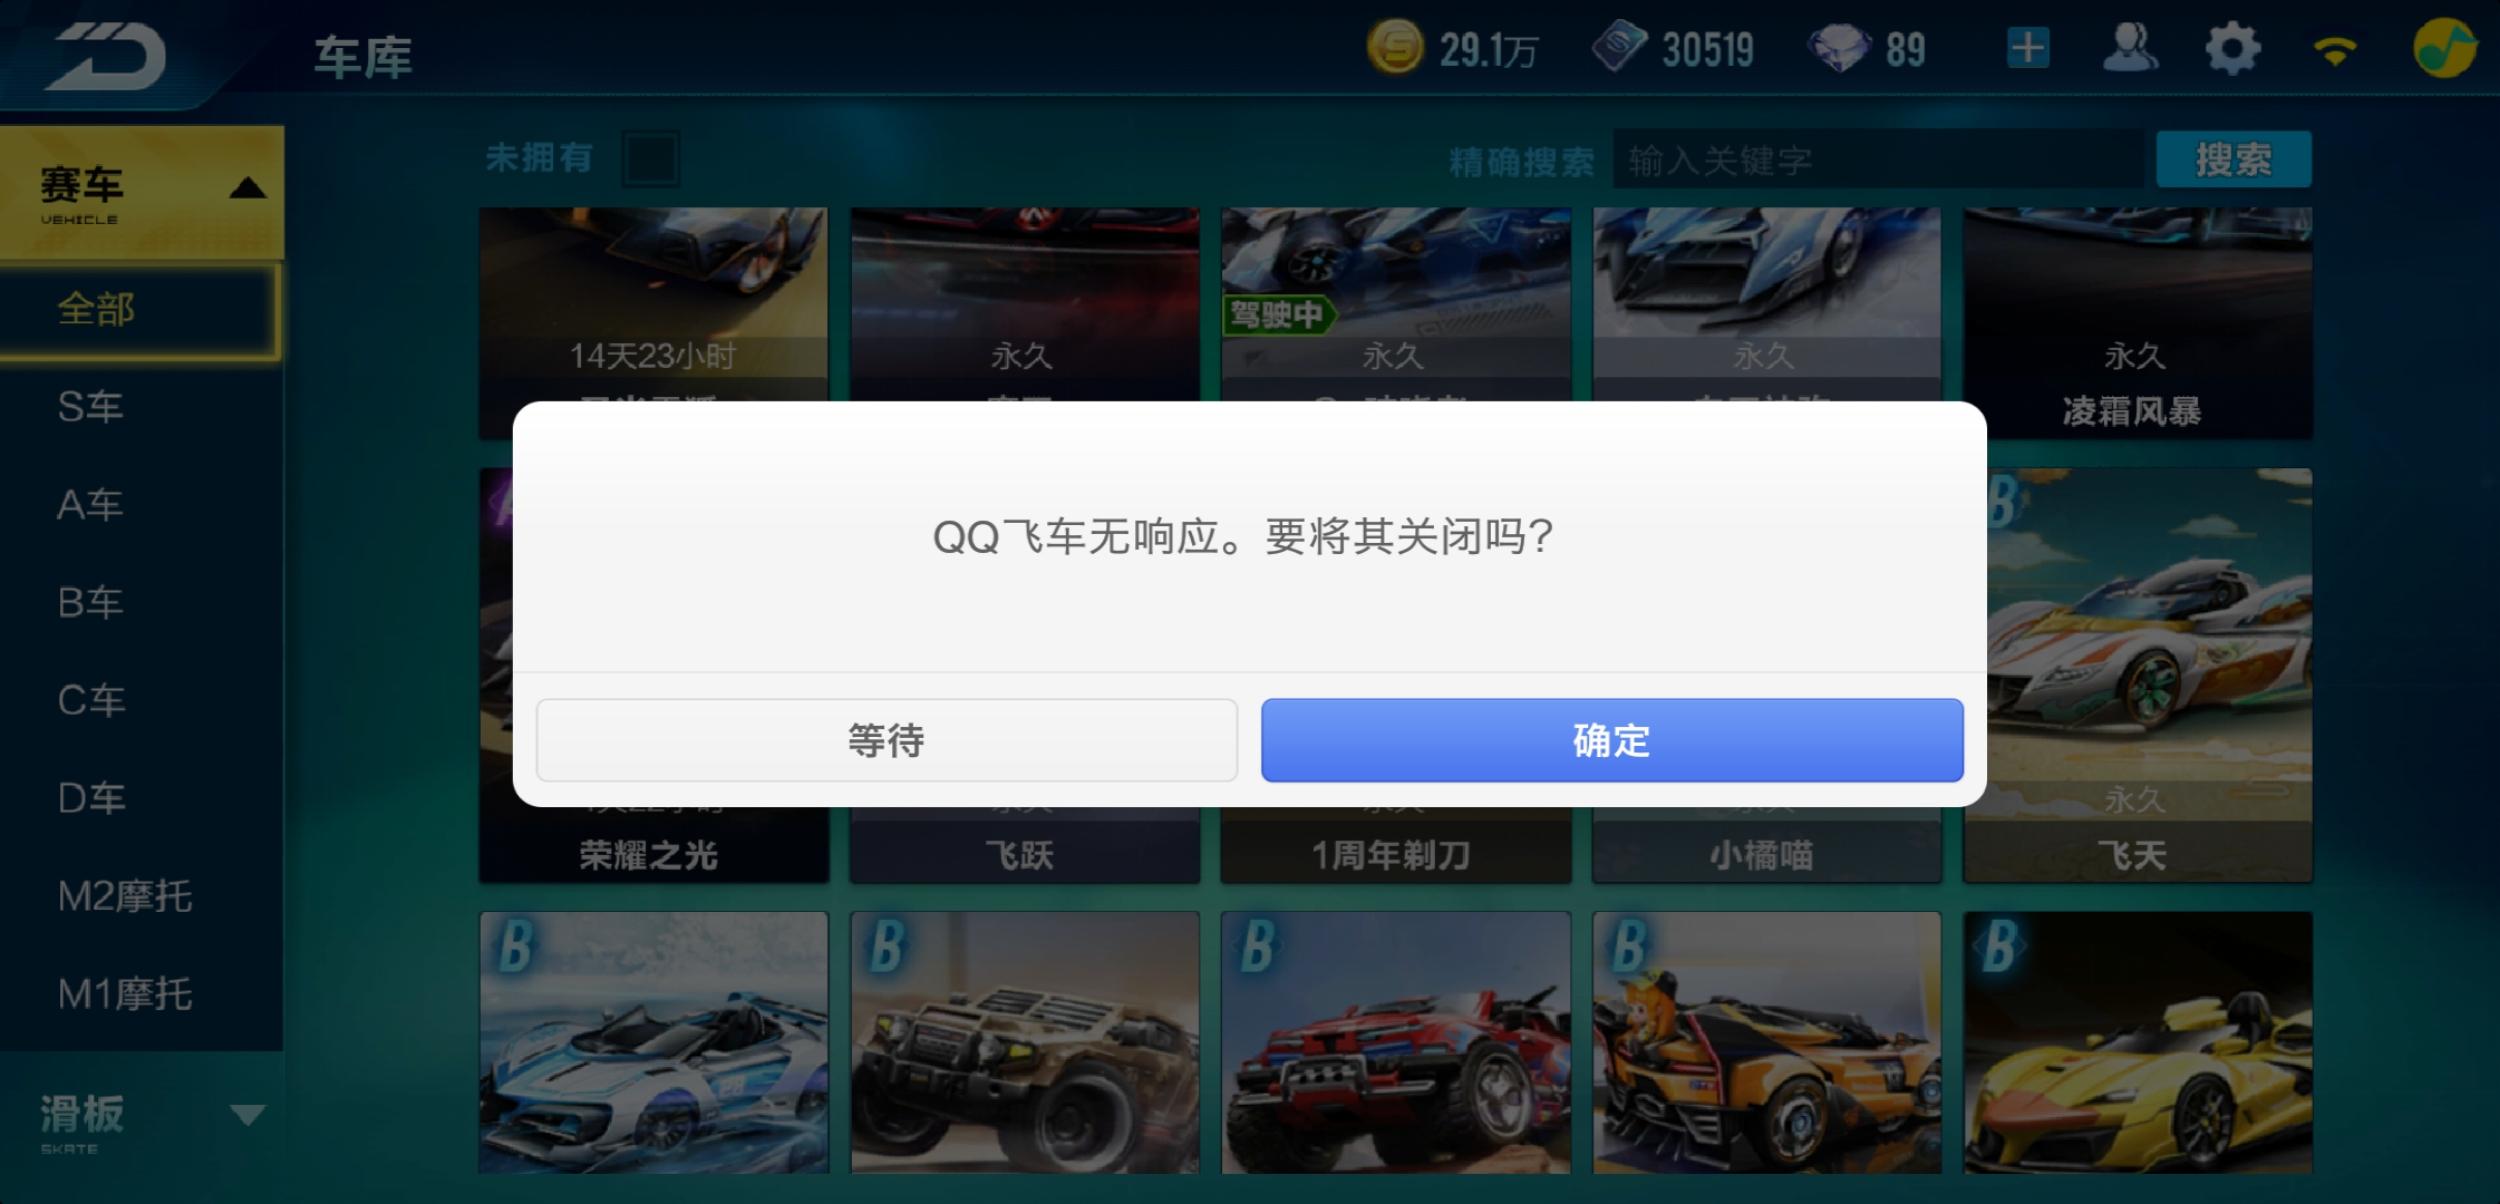 Screenshot_2019-01-17-02-04-52-378_QQ??.png